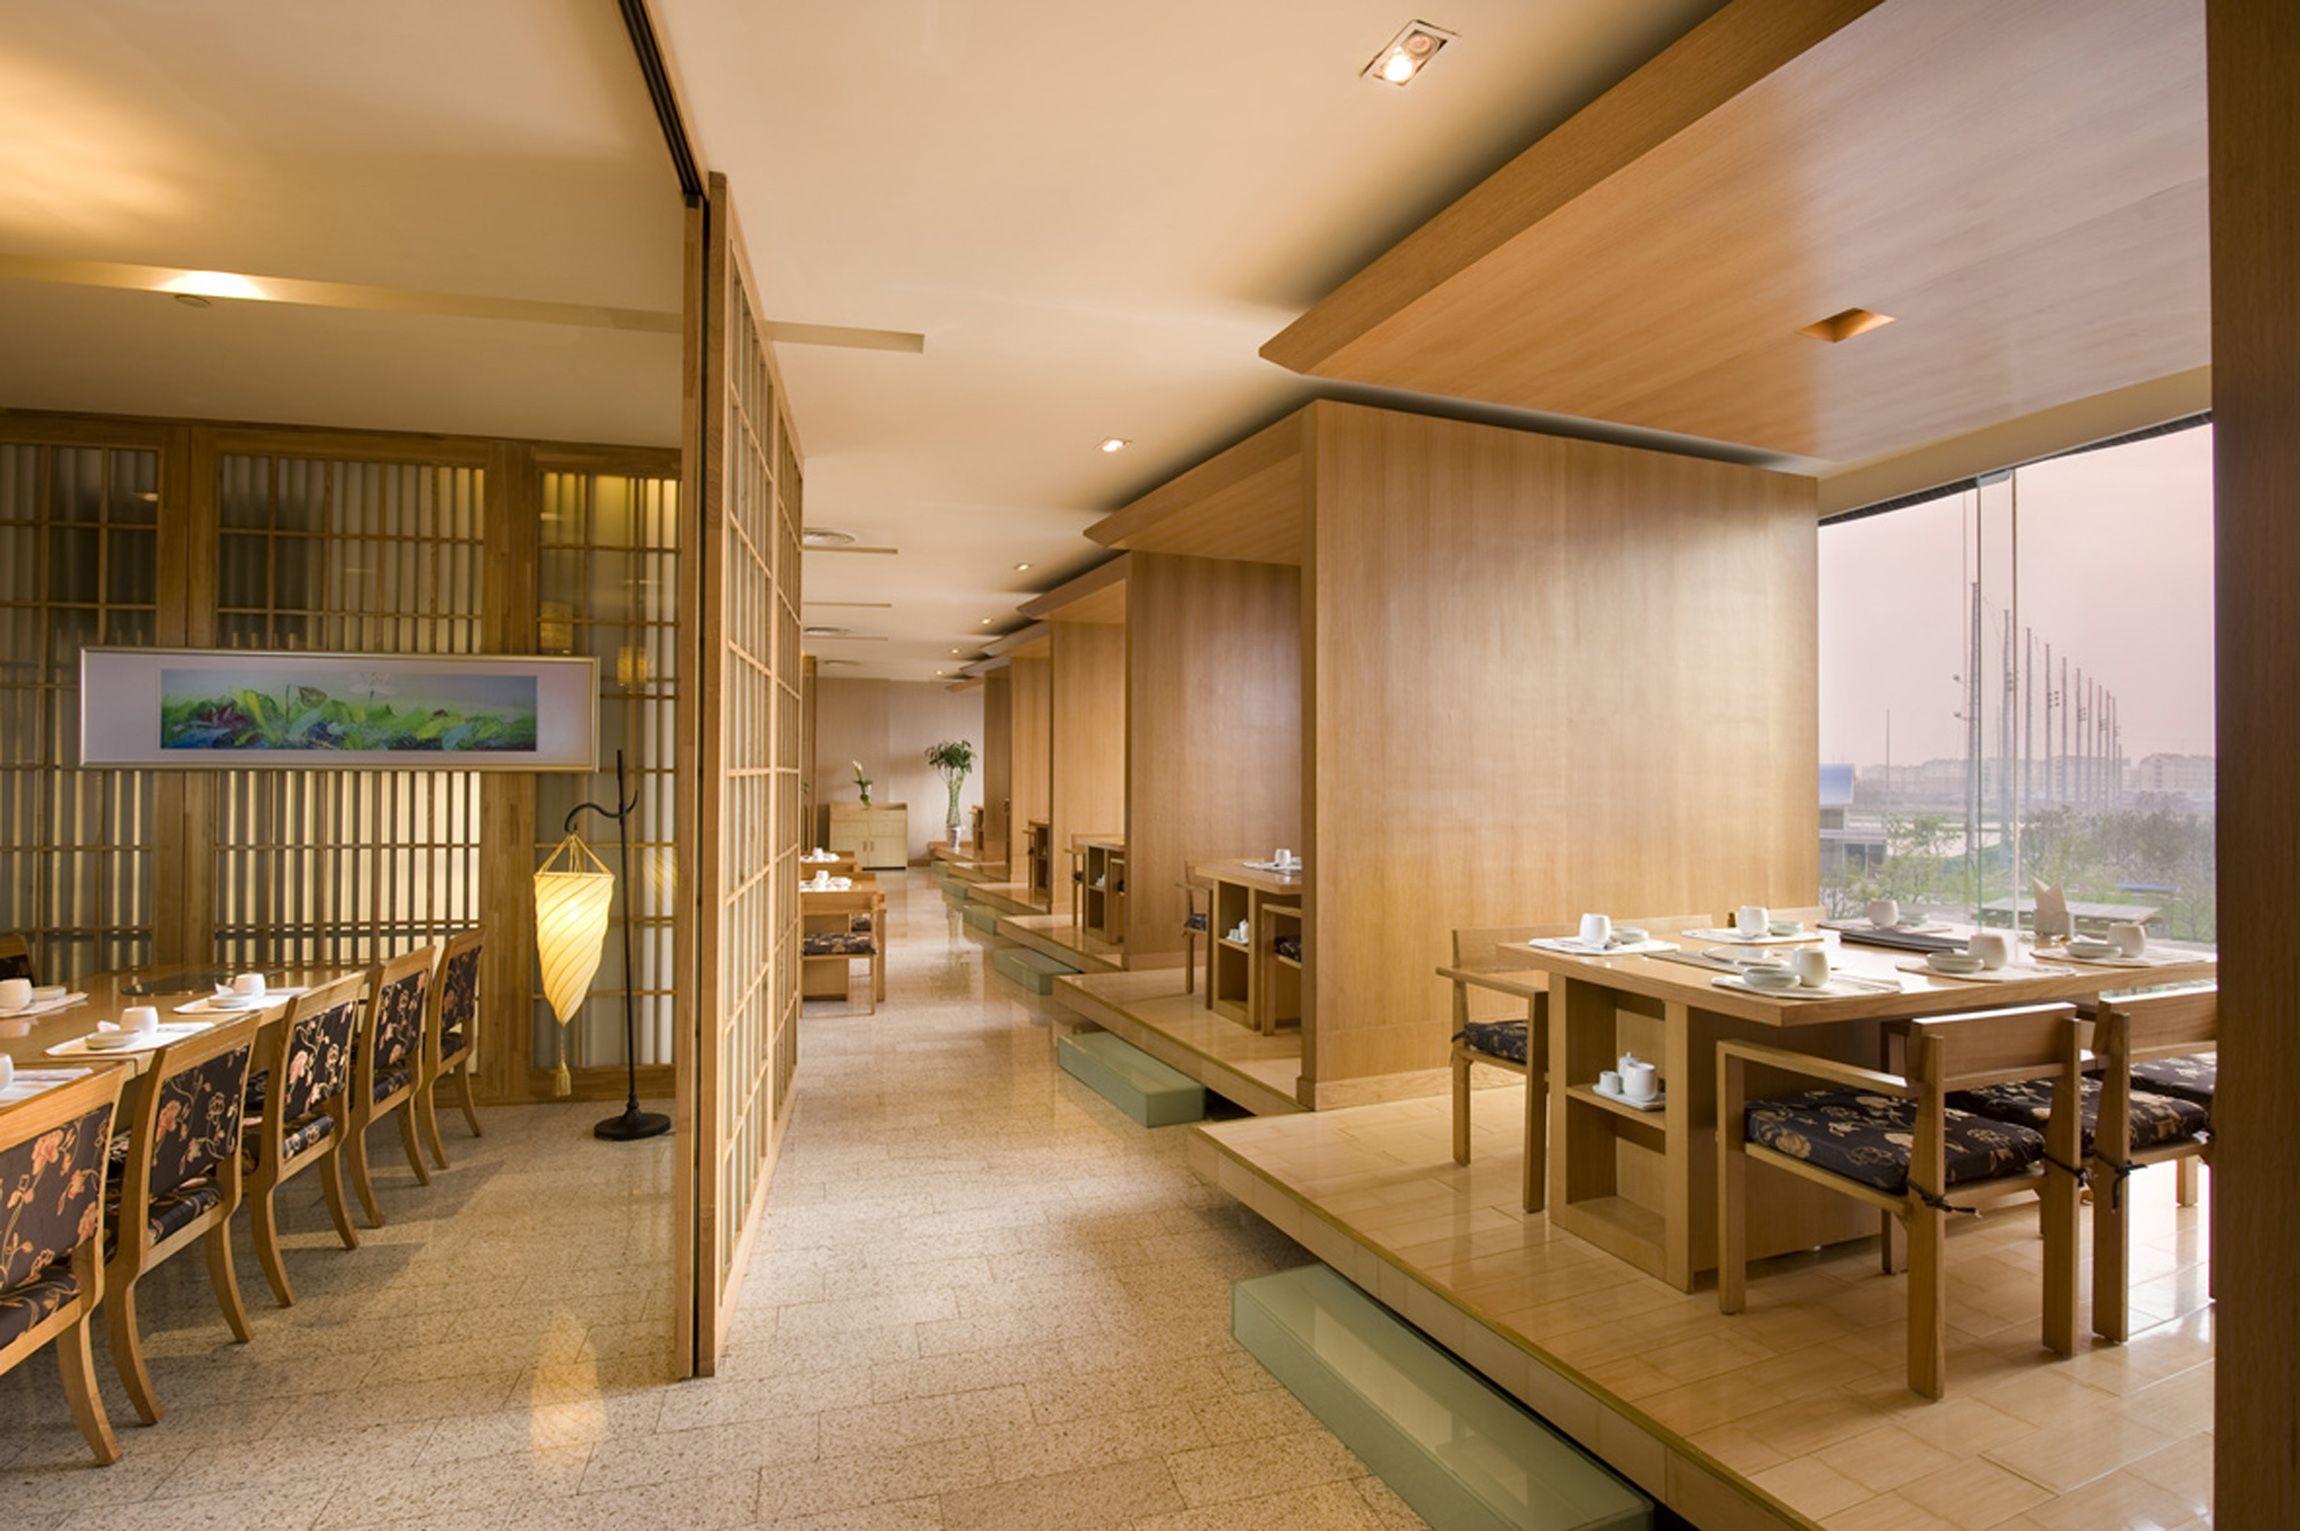 Korean Interior Design | F&B & Dining | Pinterest |Novel ...